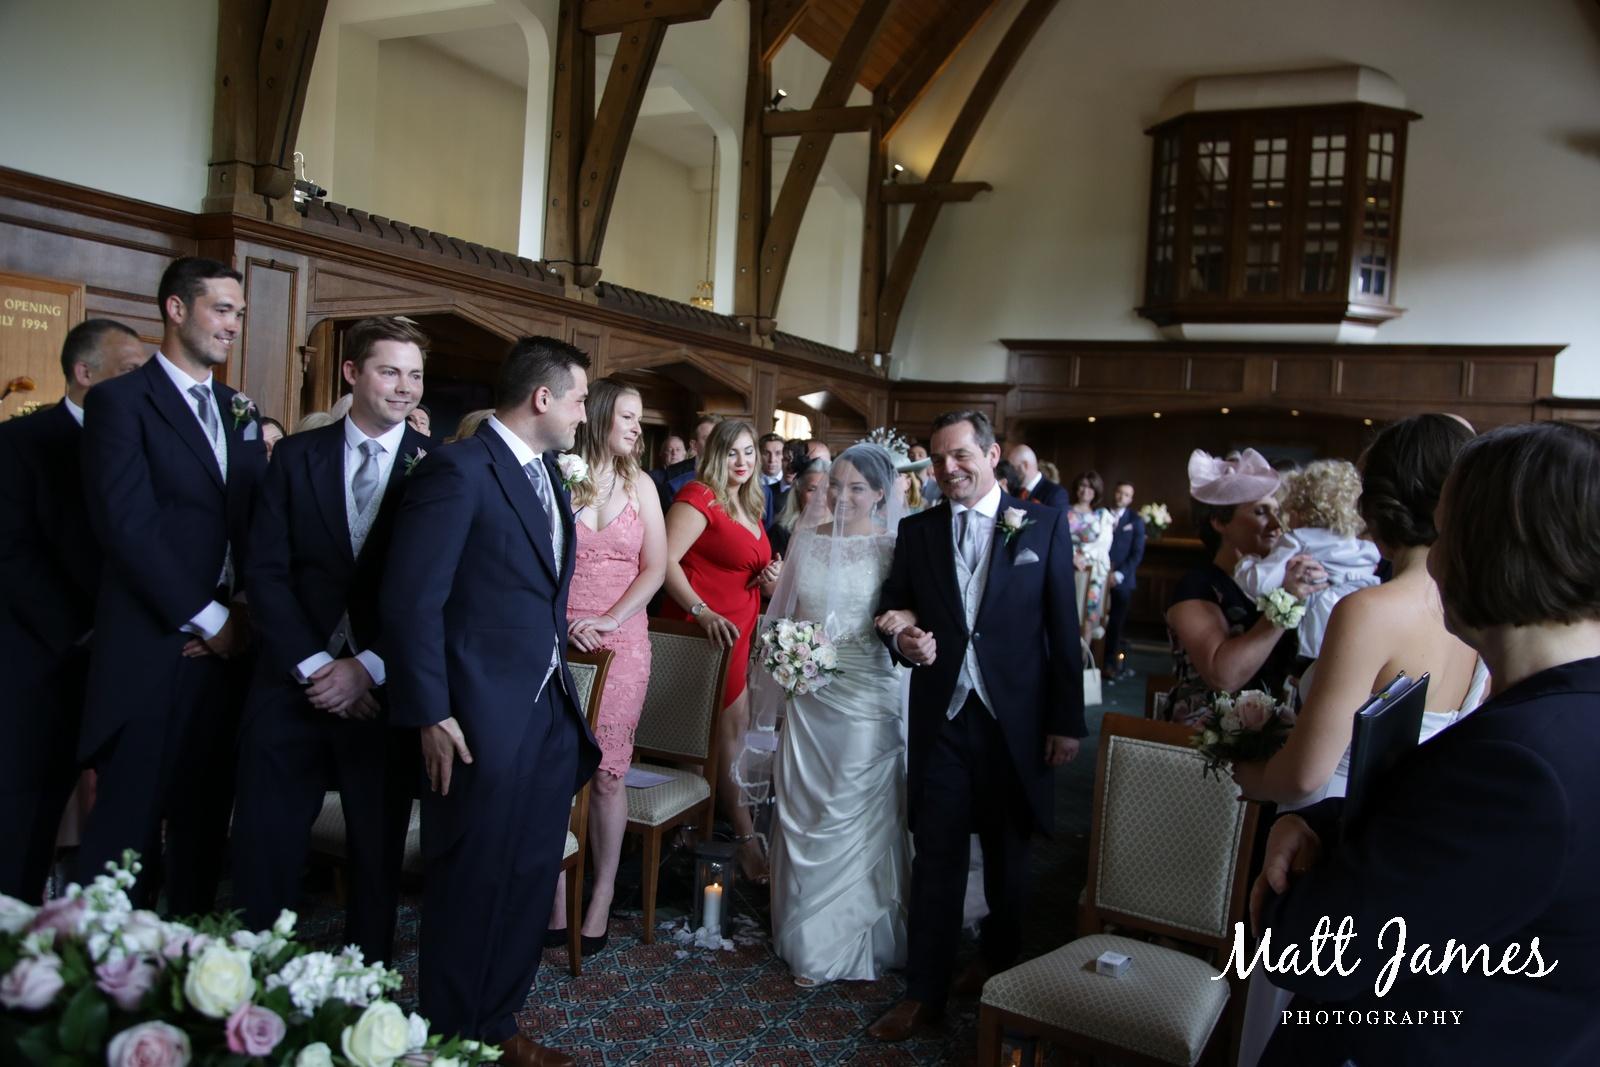 Victoria-and-Len-Goodman-London-Golf-Club-Wedding25